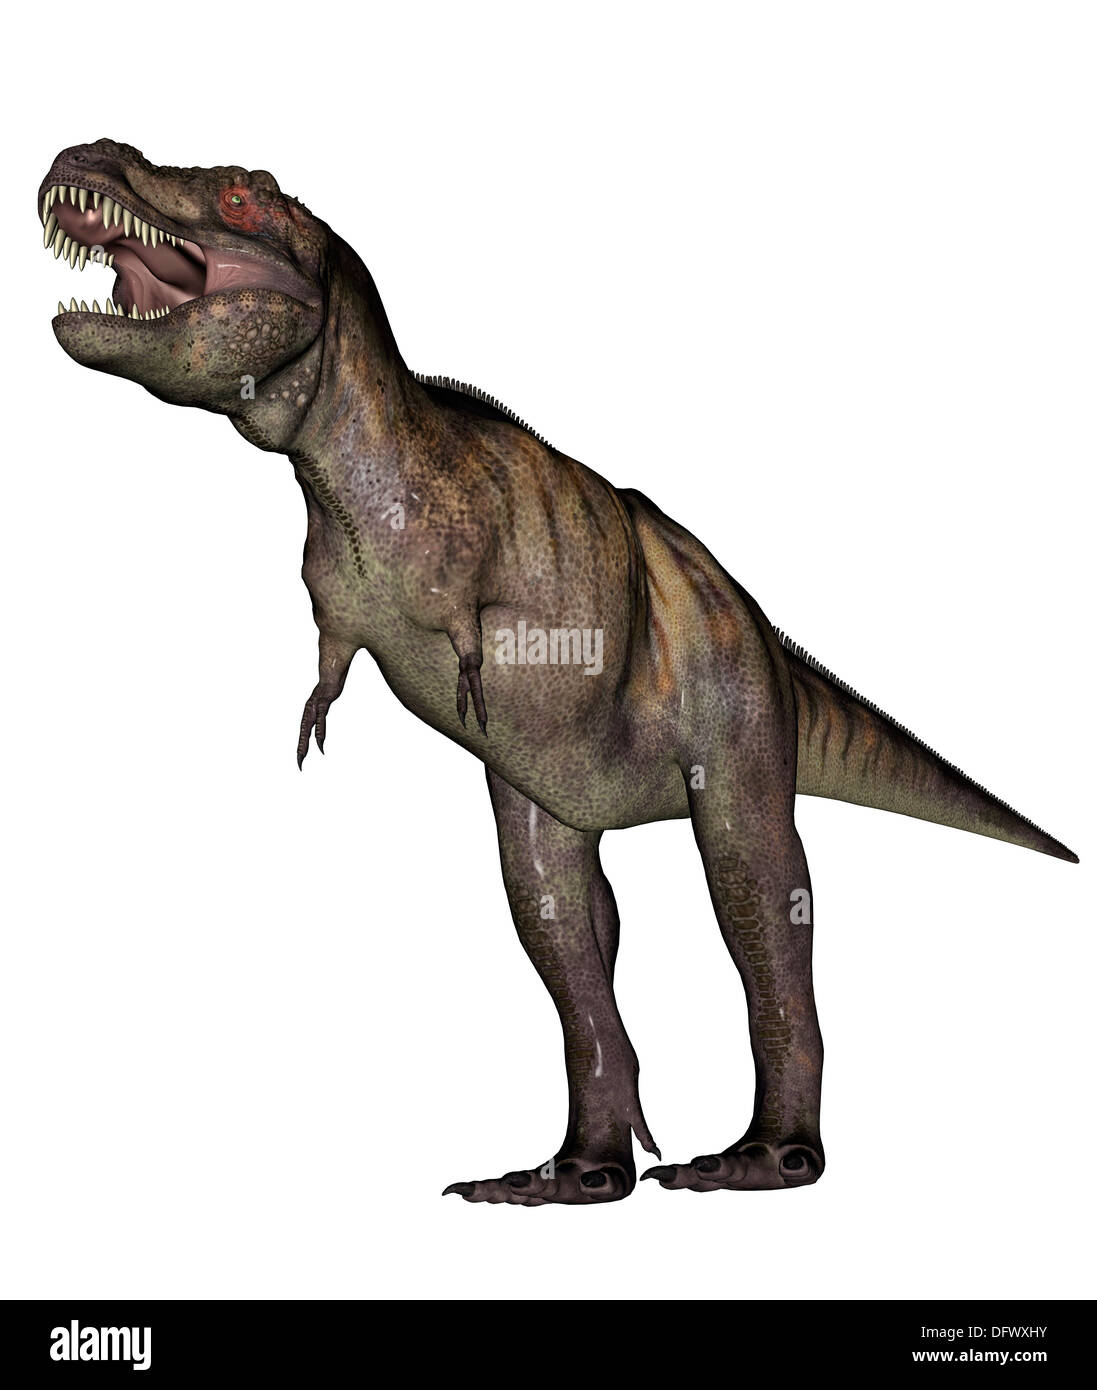 Aggressive Tyrannosaurus Rex growling, white background. - Stock Image